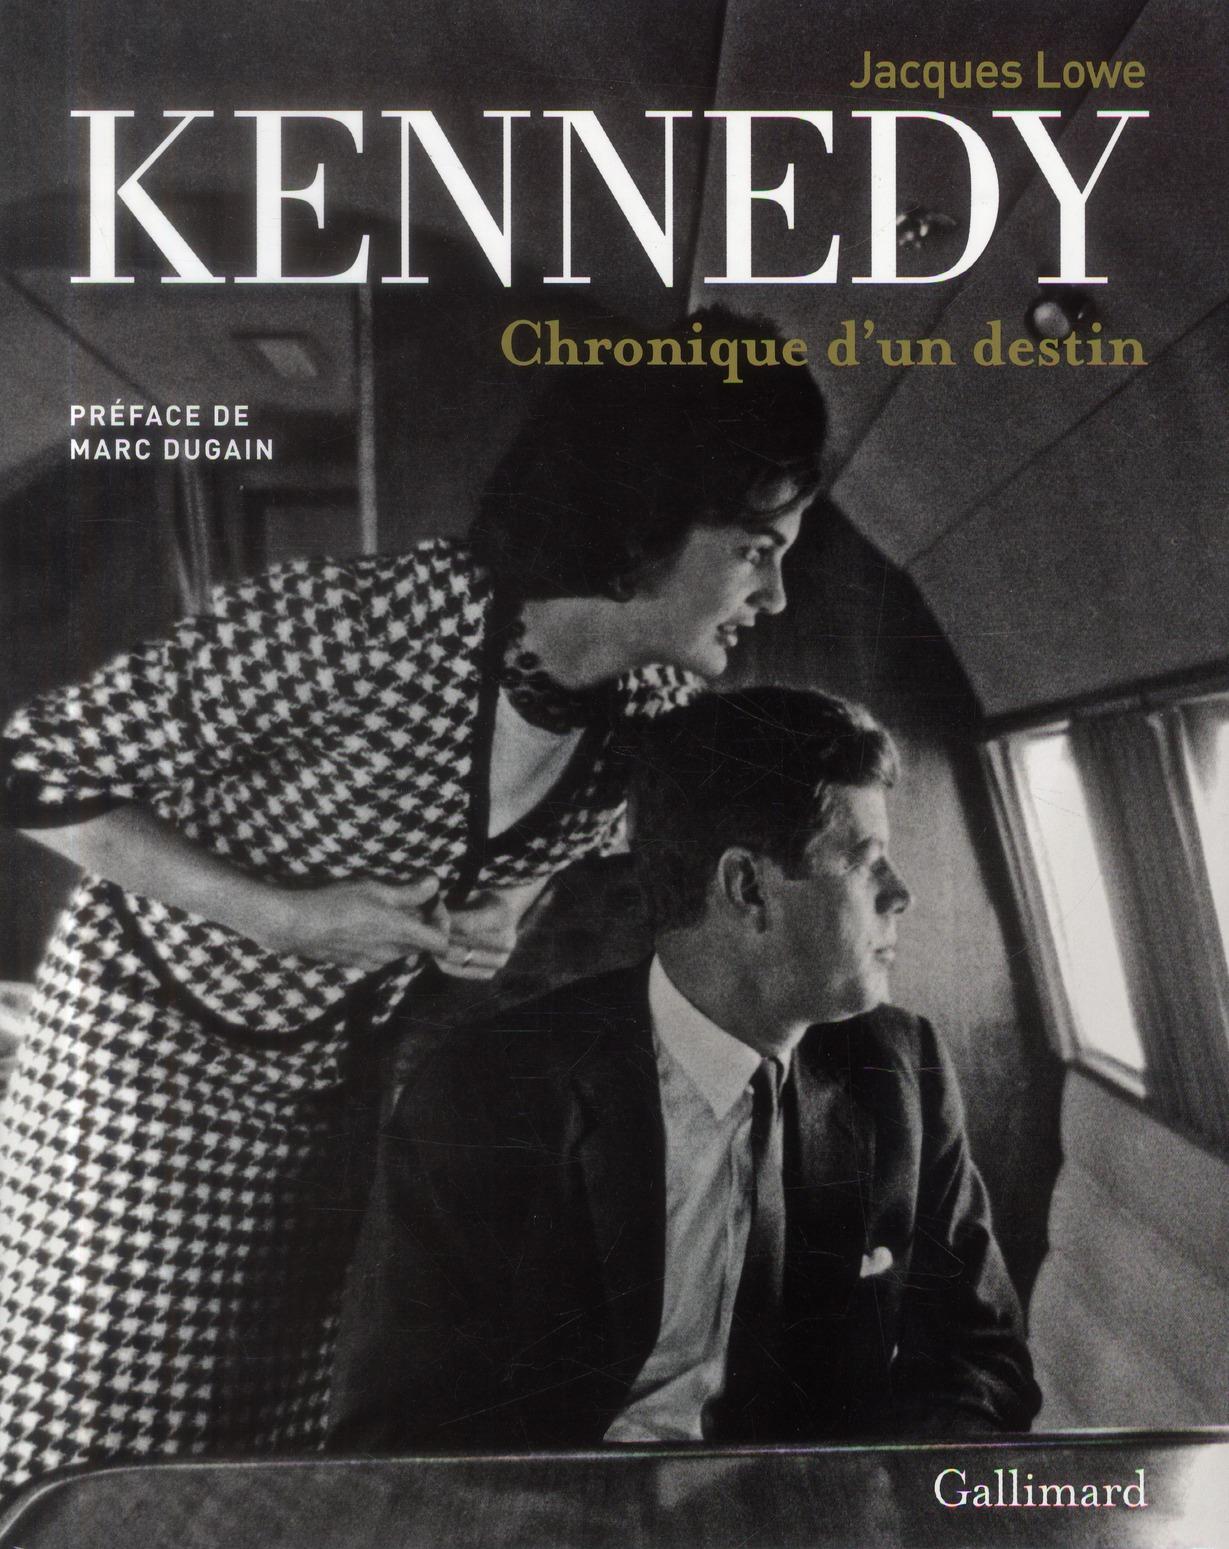 KENNEDY CHRONIQUE D'UN DESTIN